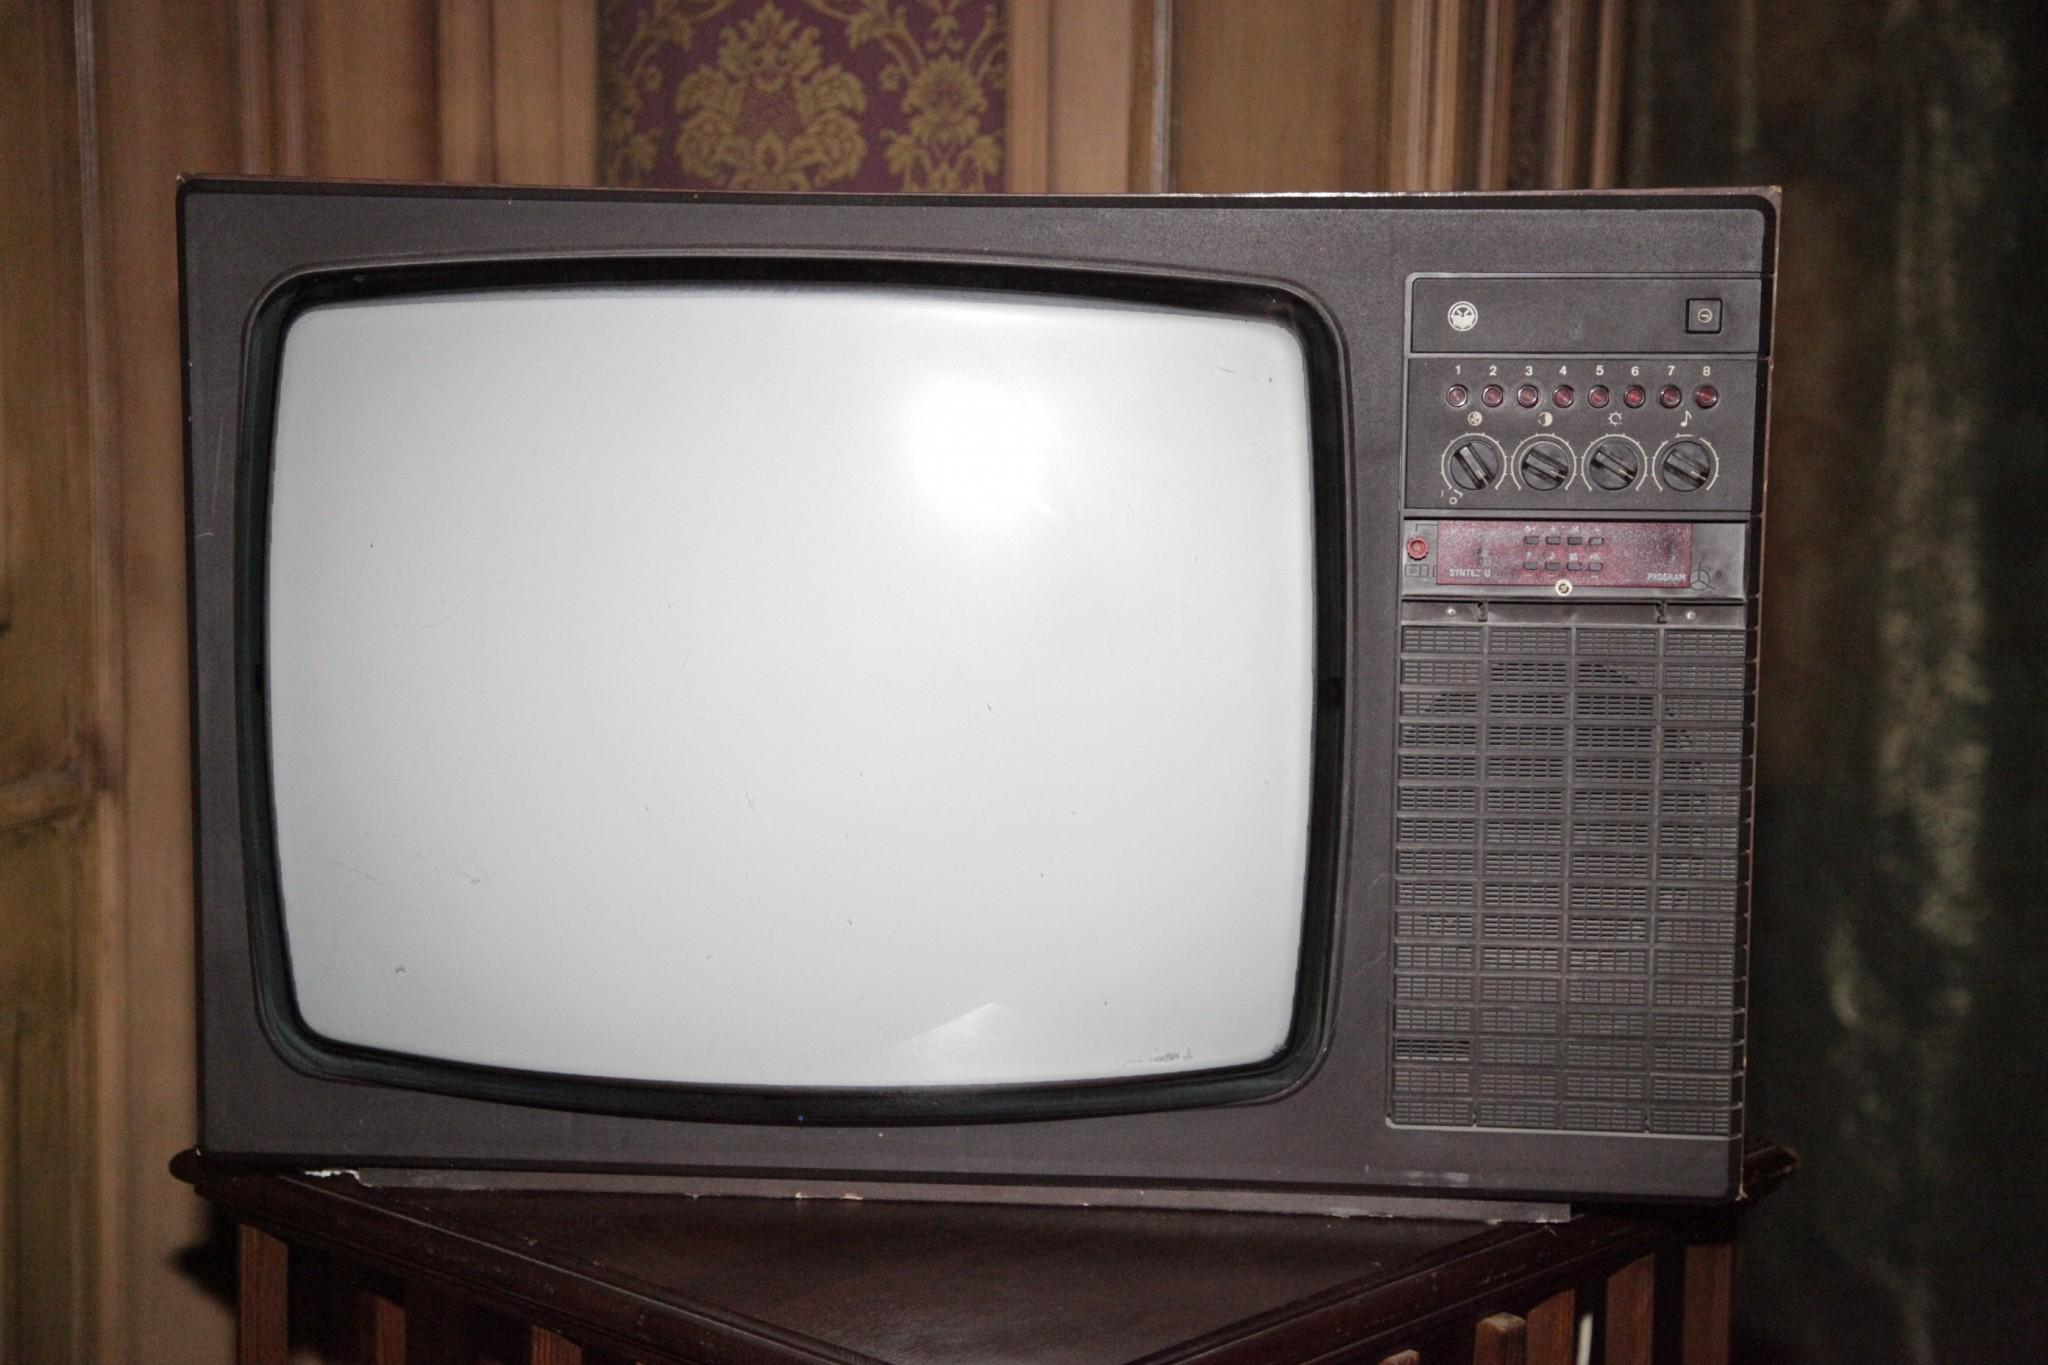 Тв тумбы под телевизор фото своими руками можно найти